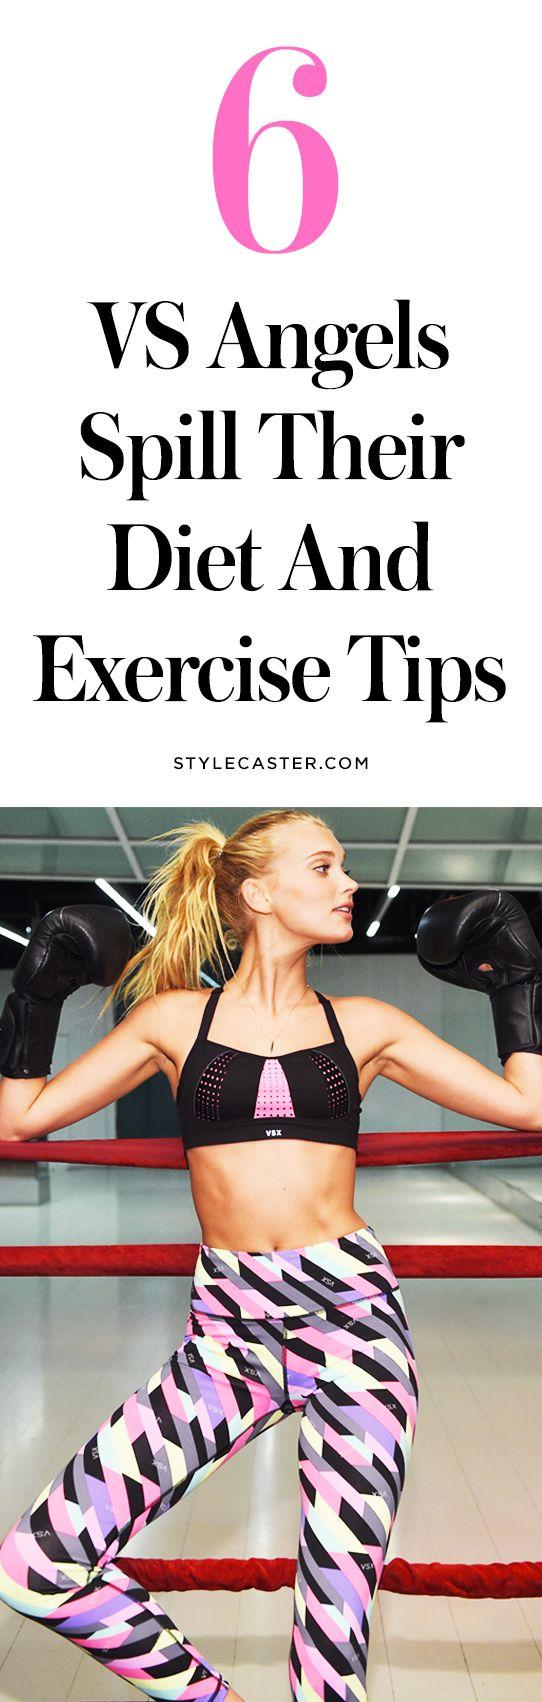 6 Victoria's Secret Angels reveal their diet + exercise secrets!   Fitness tips from supermodels Elsa Hosk, Martha Hunt, Jessica Heart, Erin Featherton, Jourdan Dunn, and Adrianna Lima...